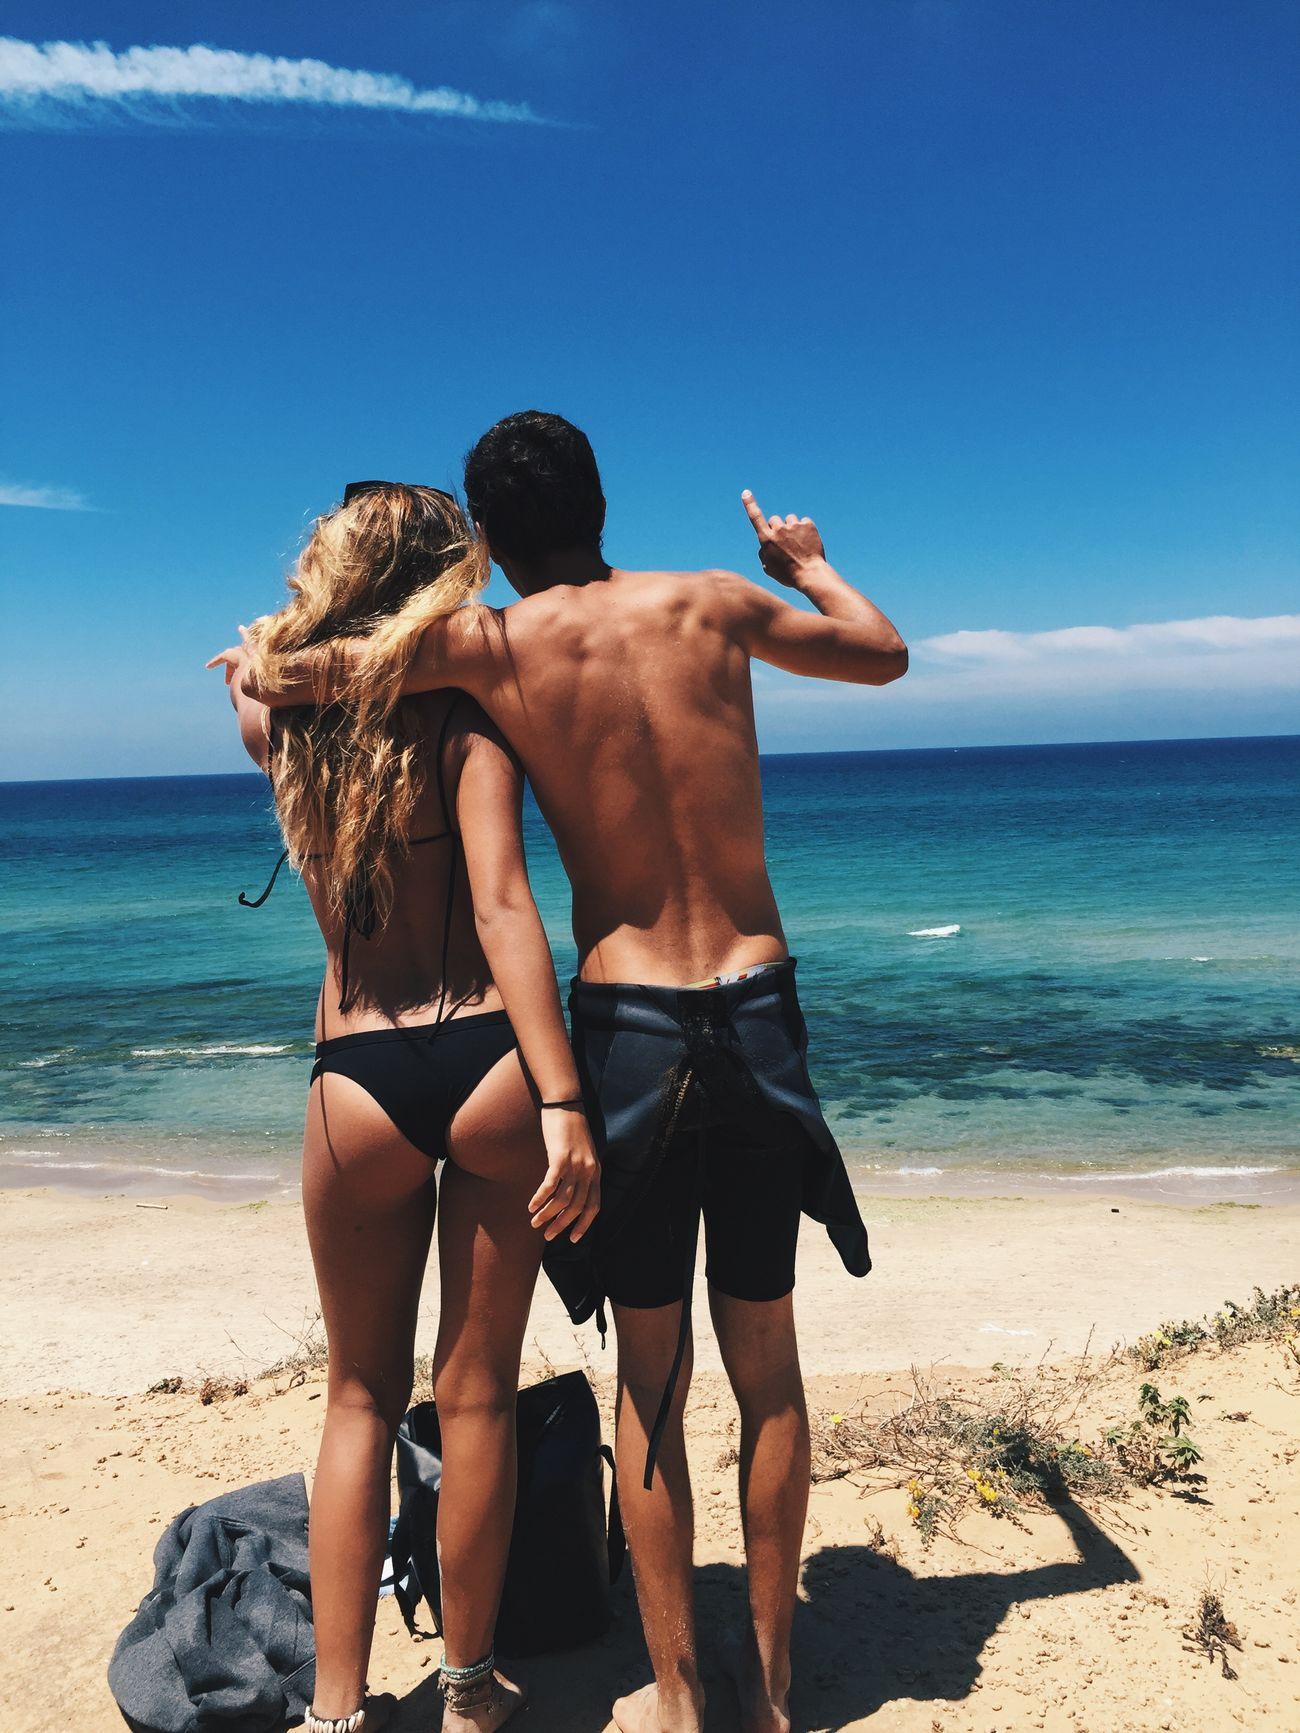 Beach kids 😎